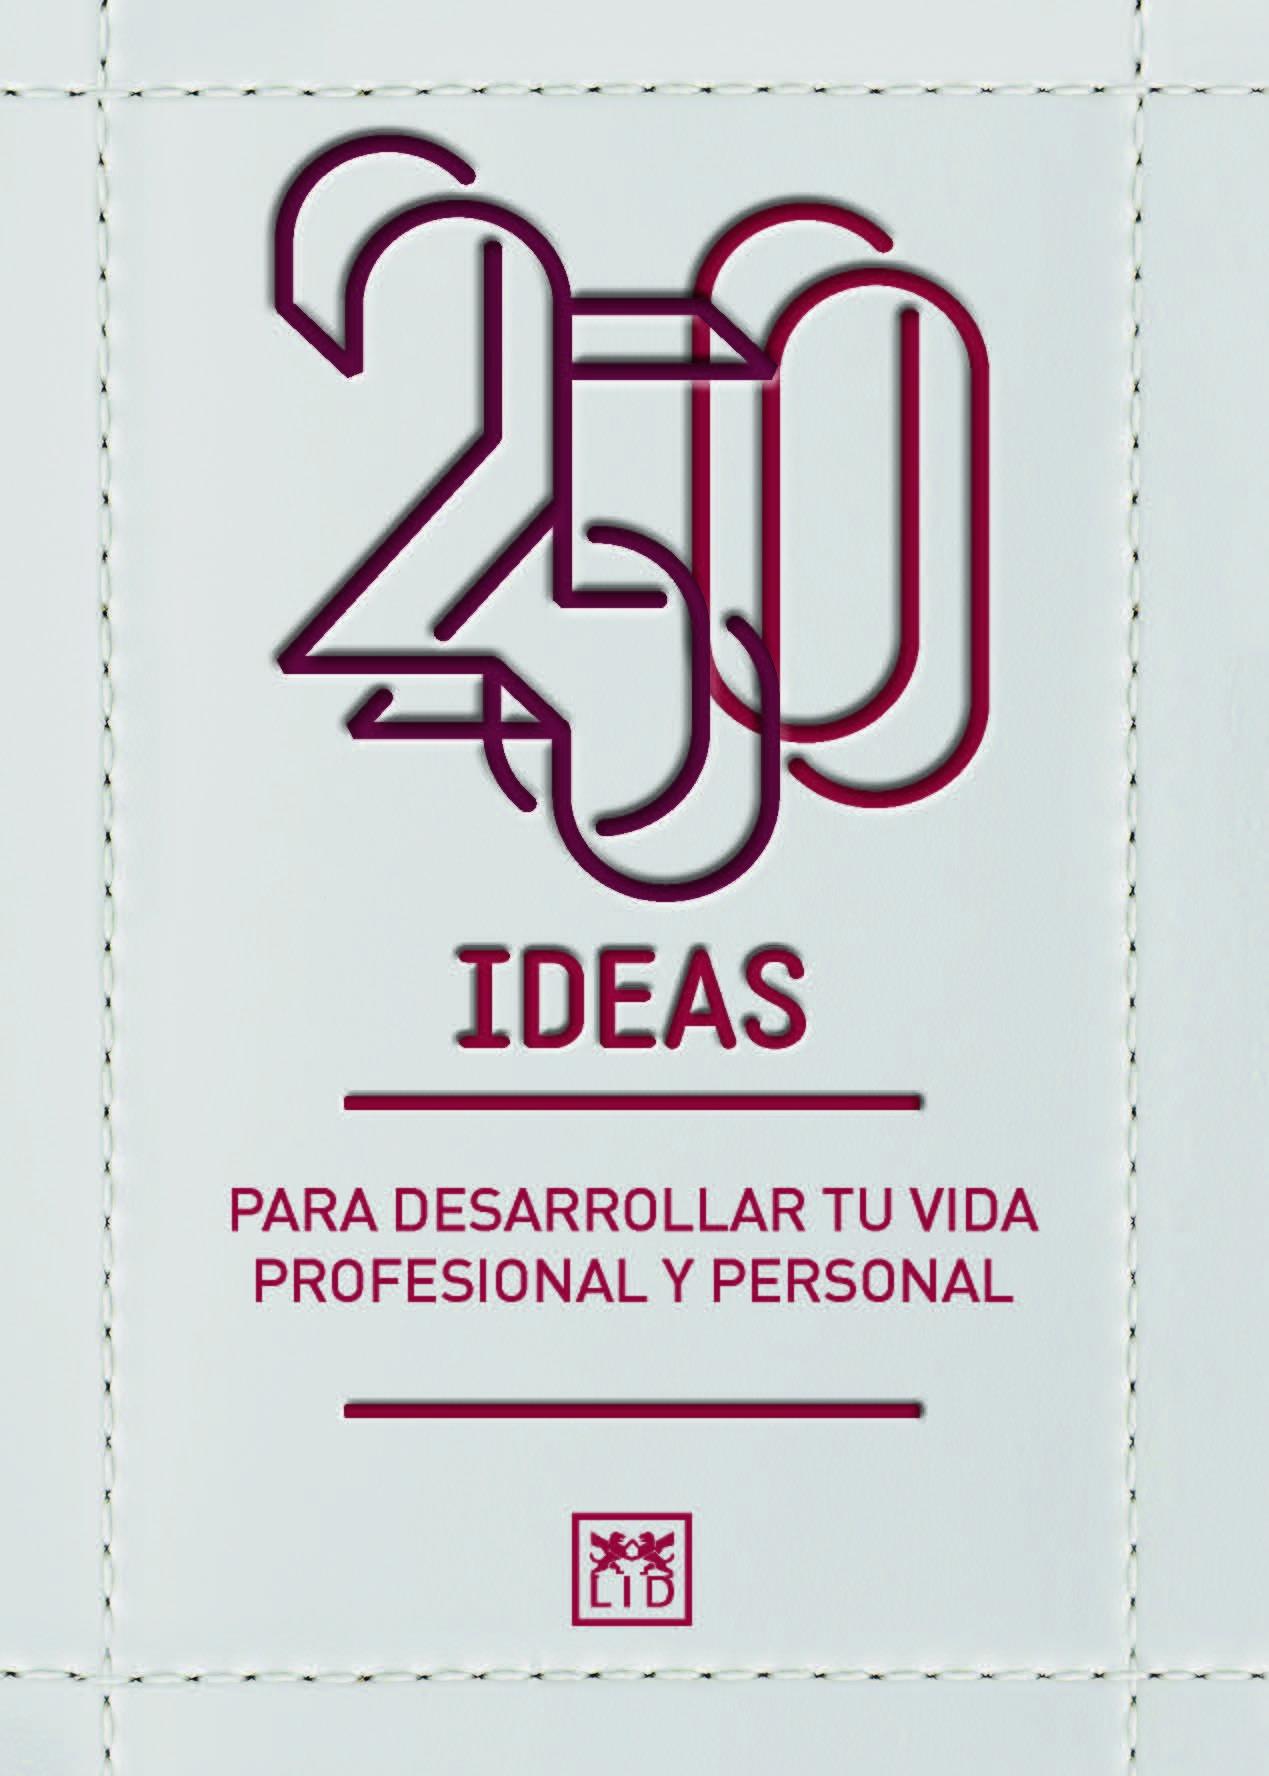 portada_250_ideas_pagina_1